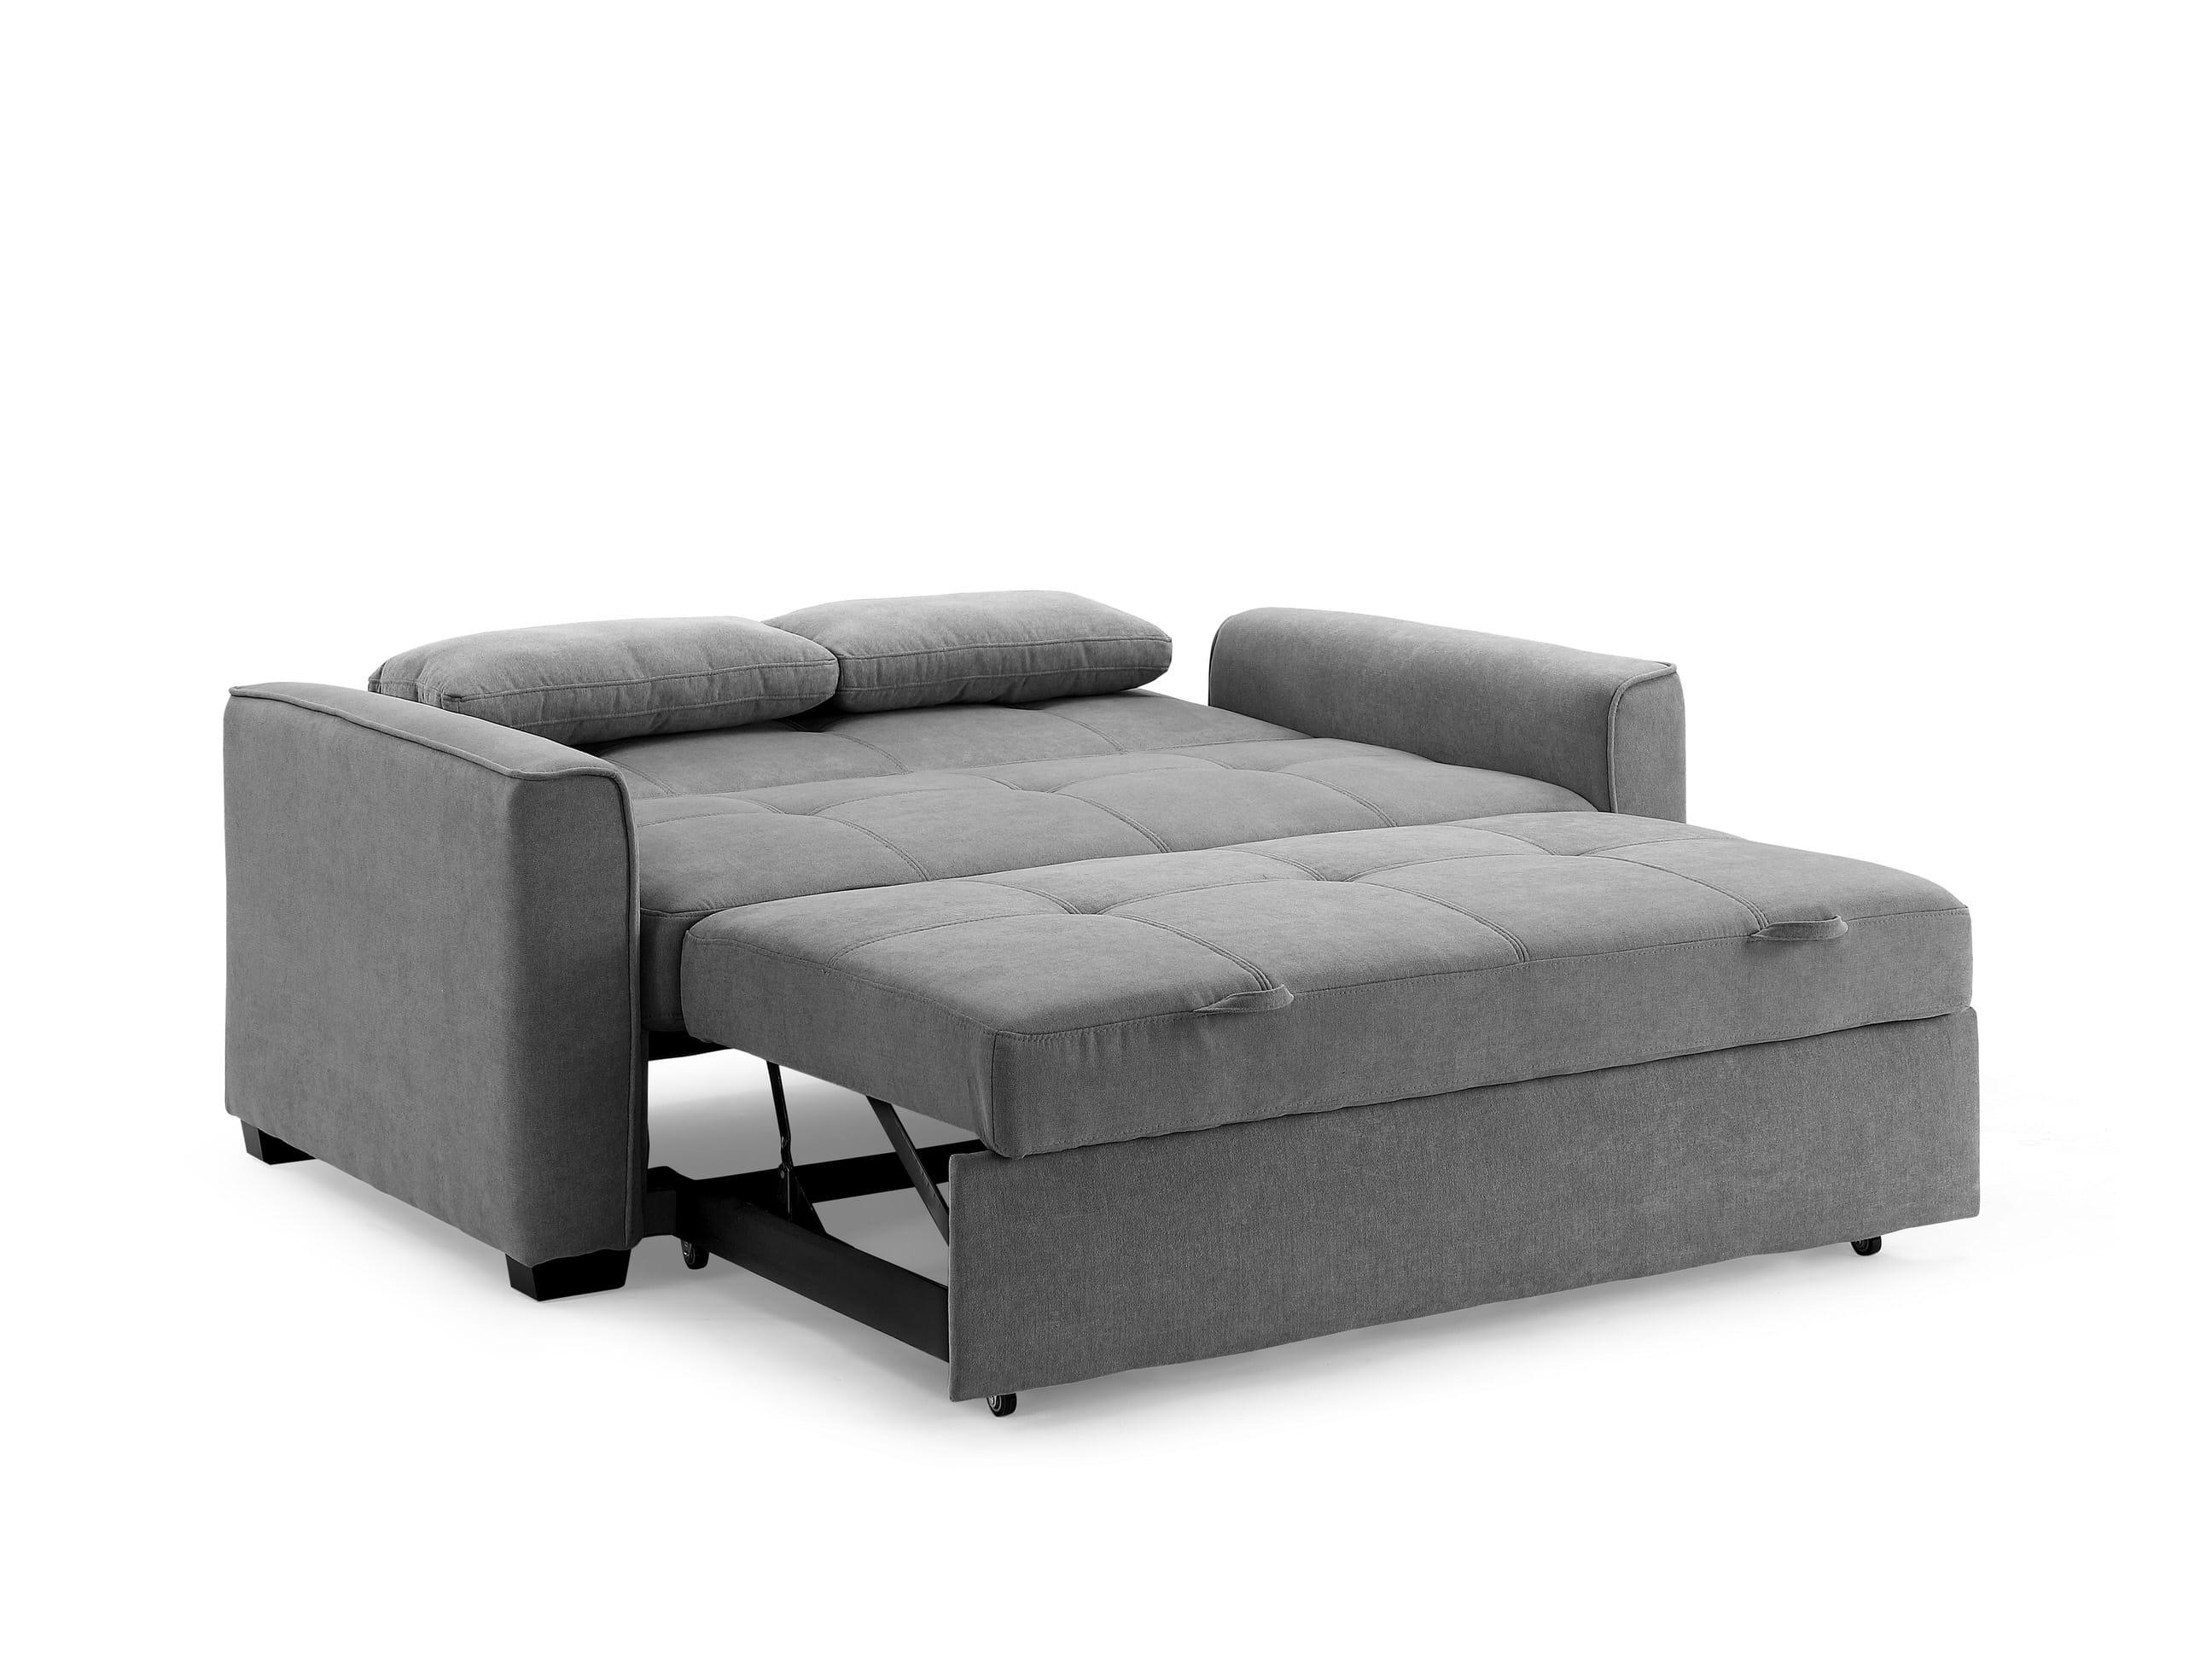 Nantucket loveseat full size sleeper light gray by nightday furniture